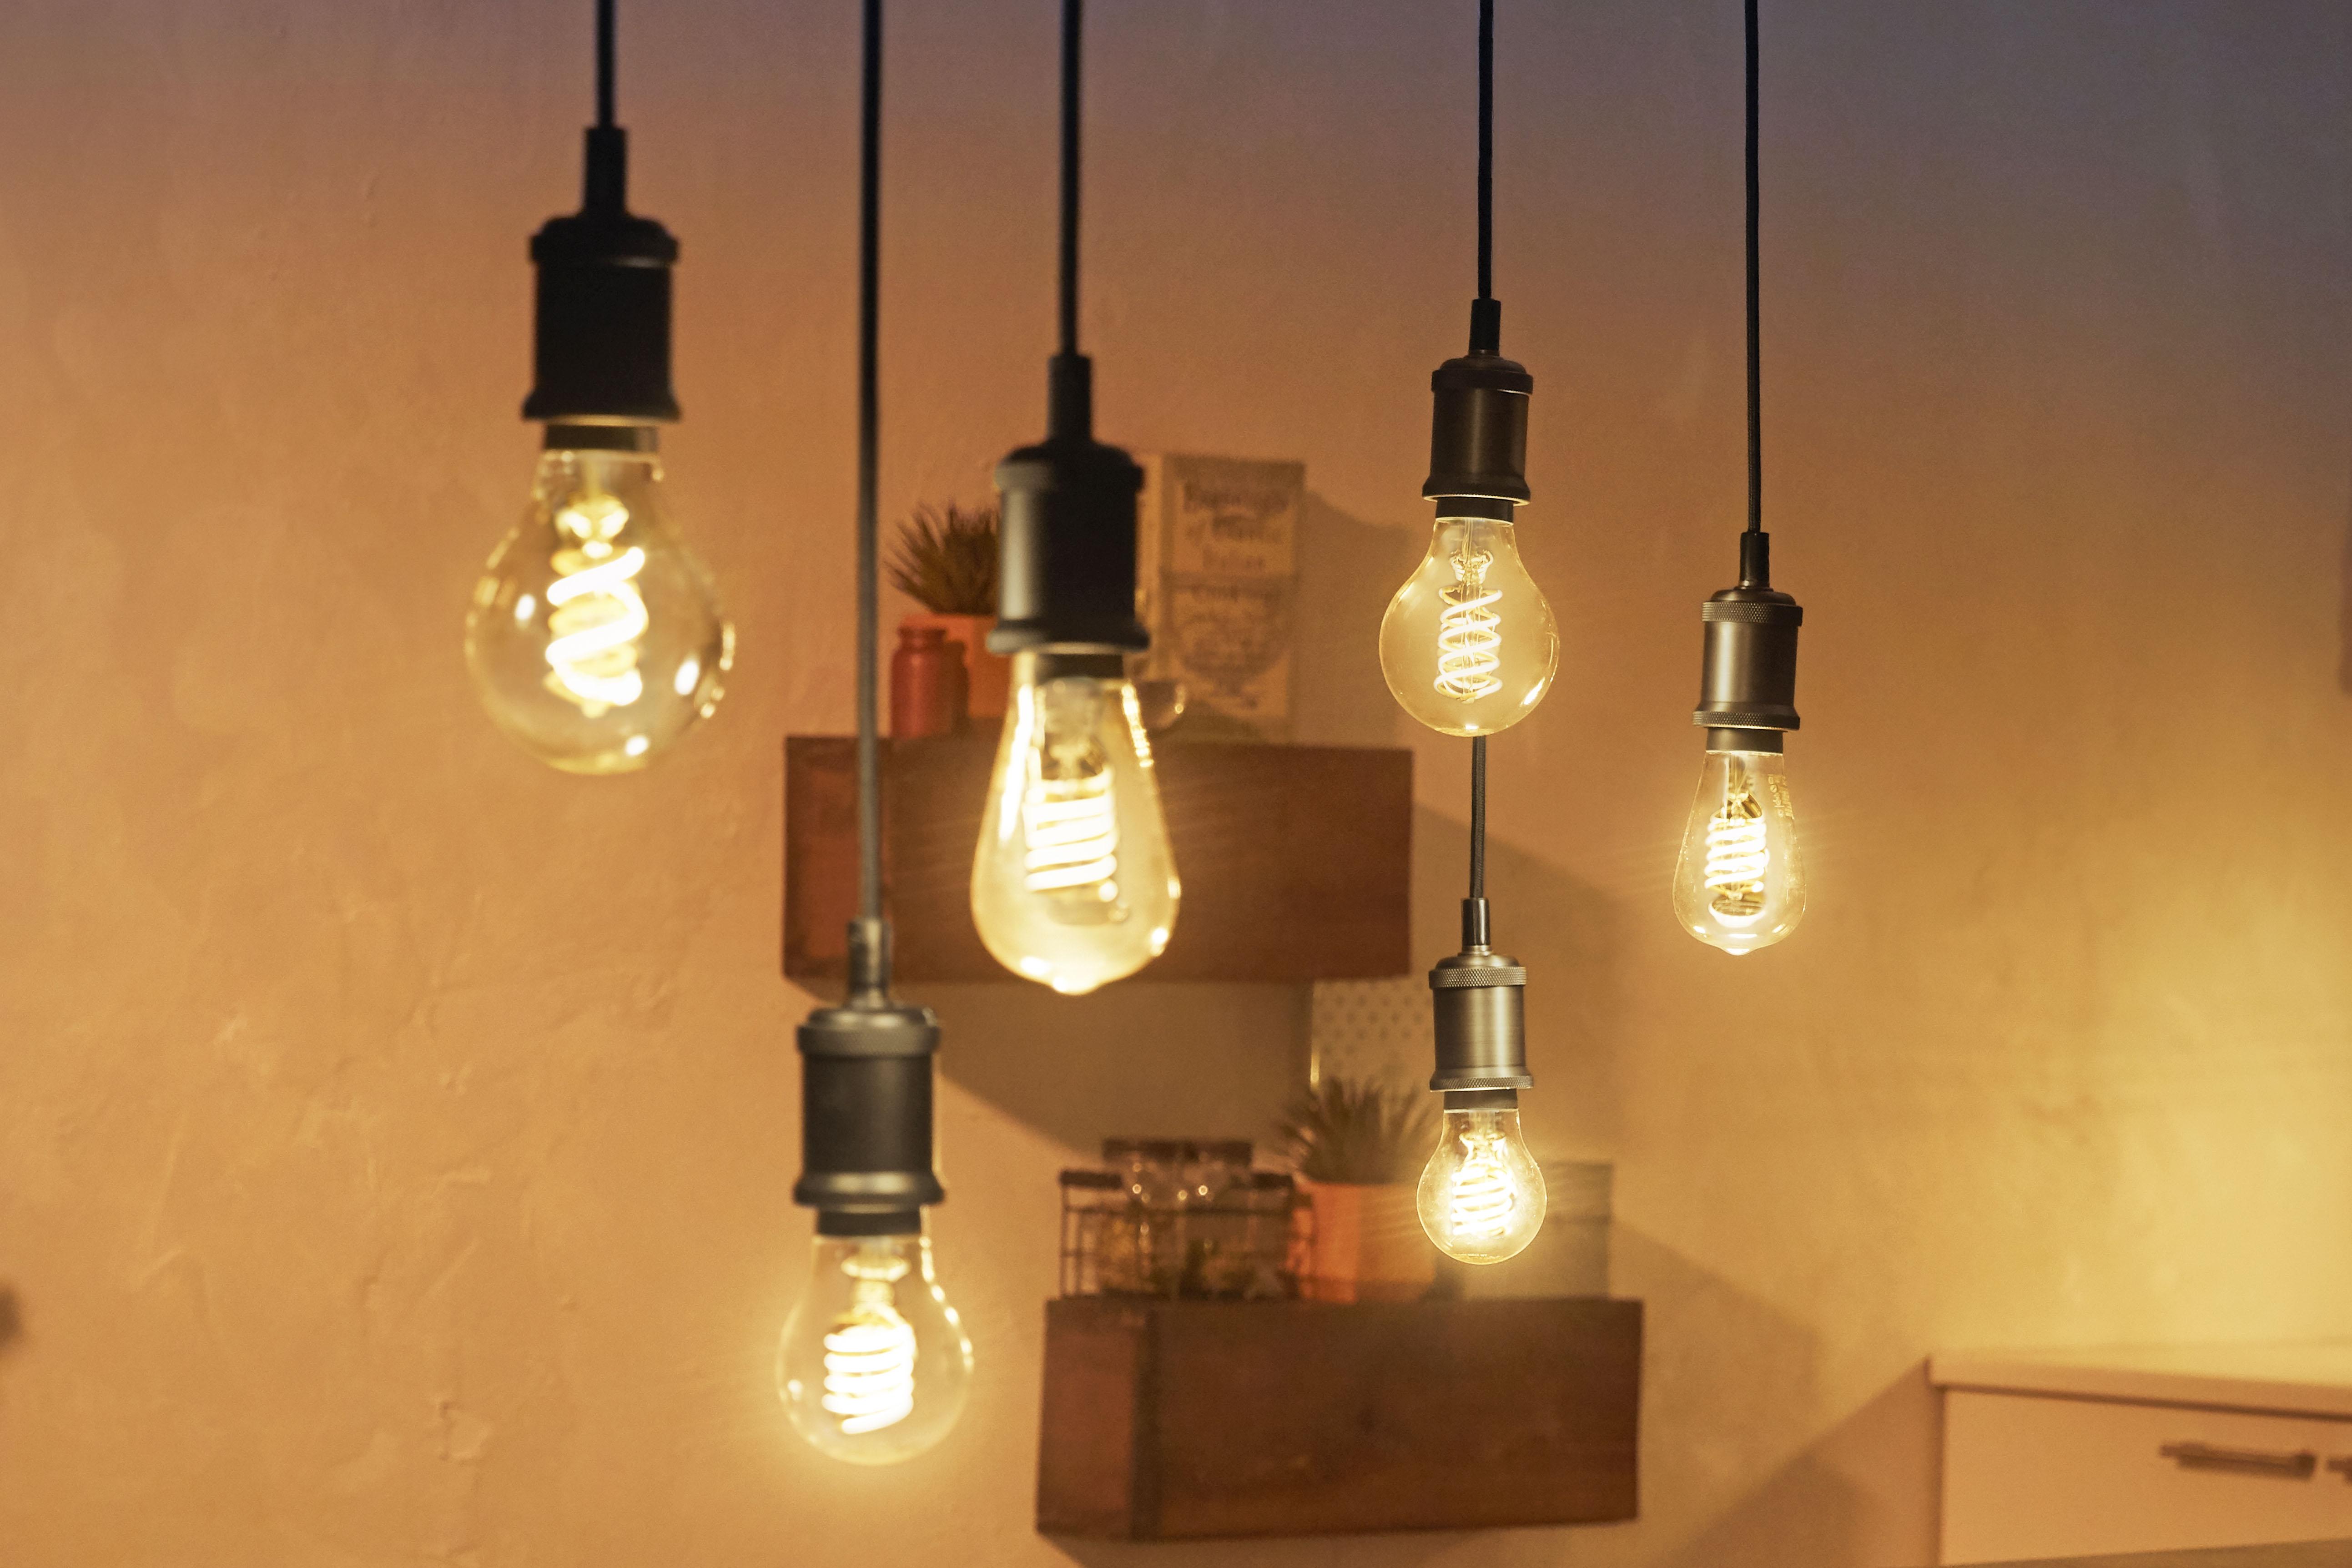 Hue Edison bulbs